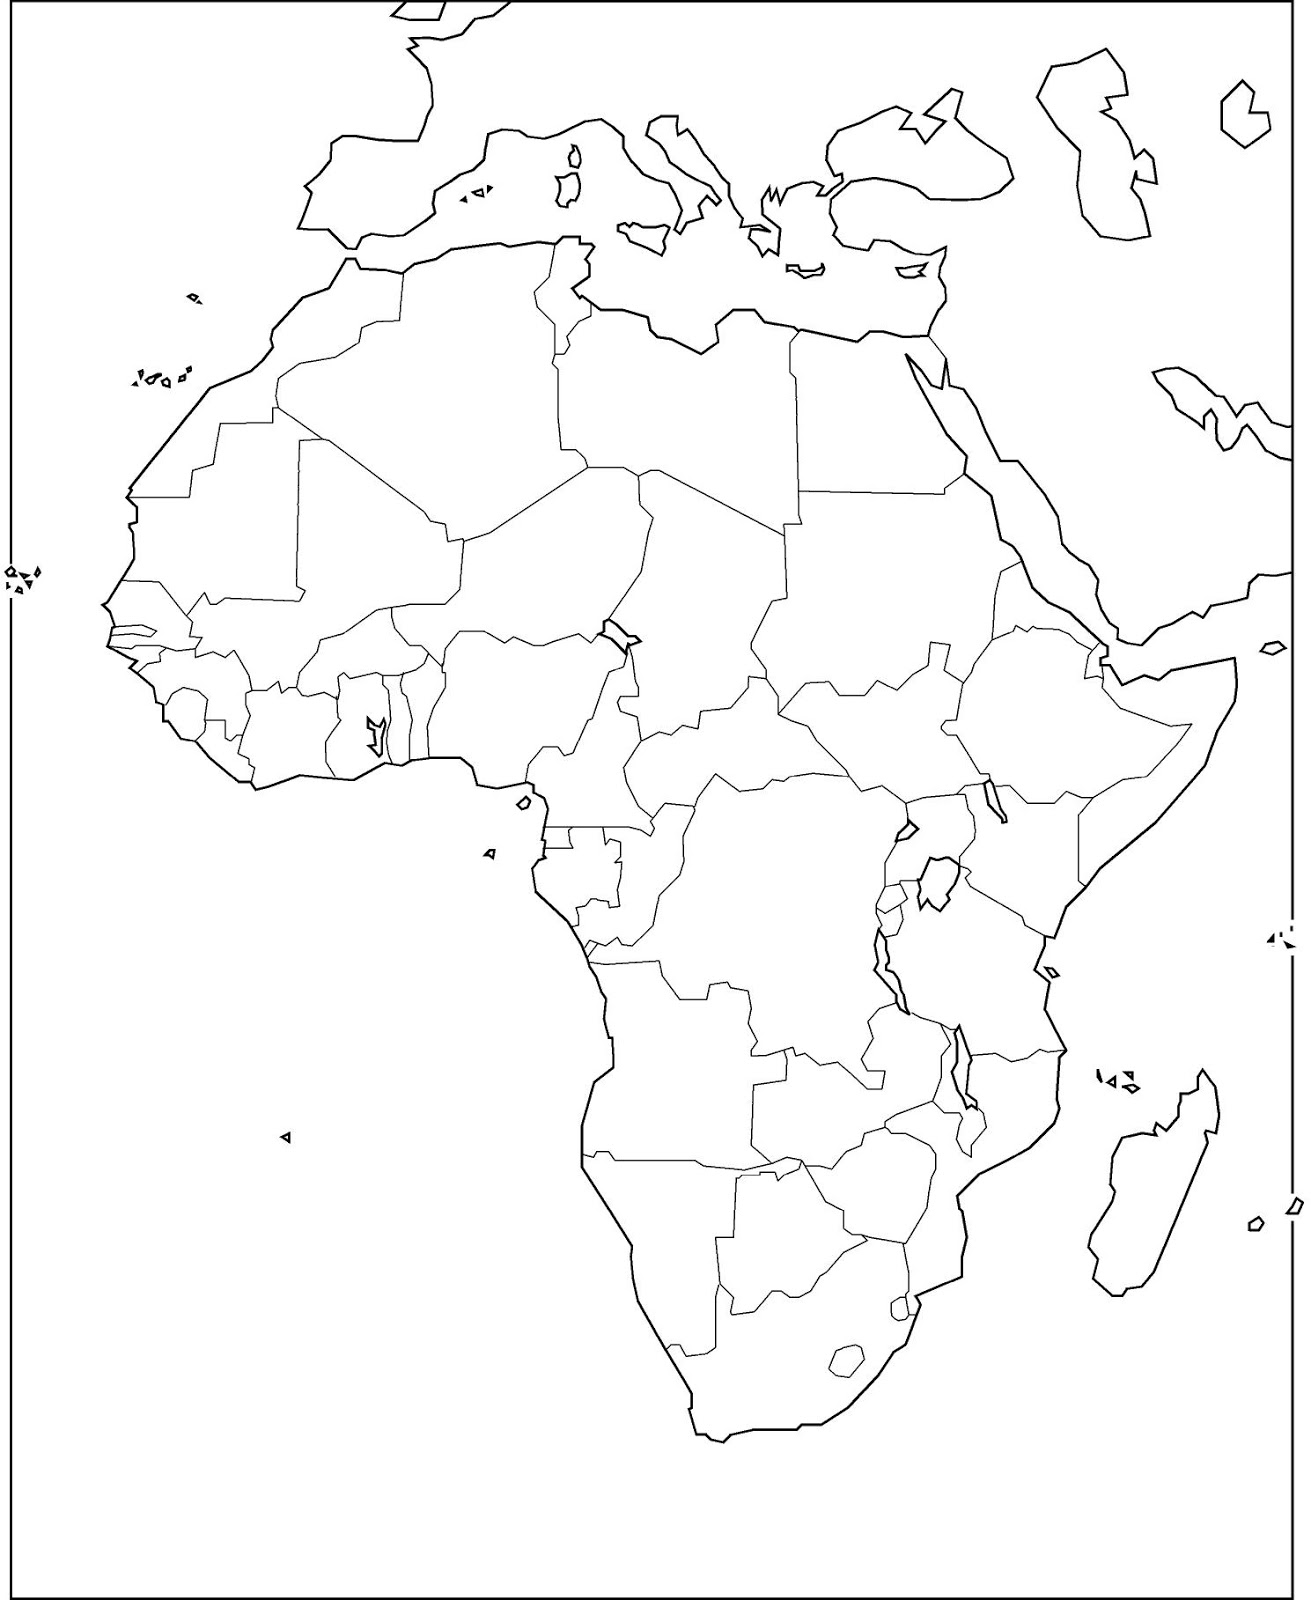 Mapa De Africa Vacio.Mapas De Africa Mapas Politicos Mapas En Blanco Mapas